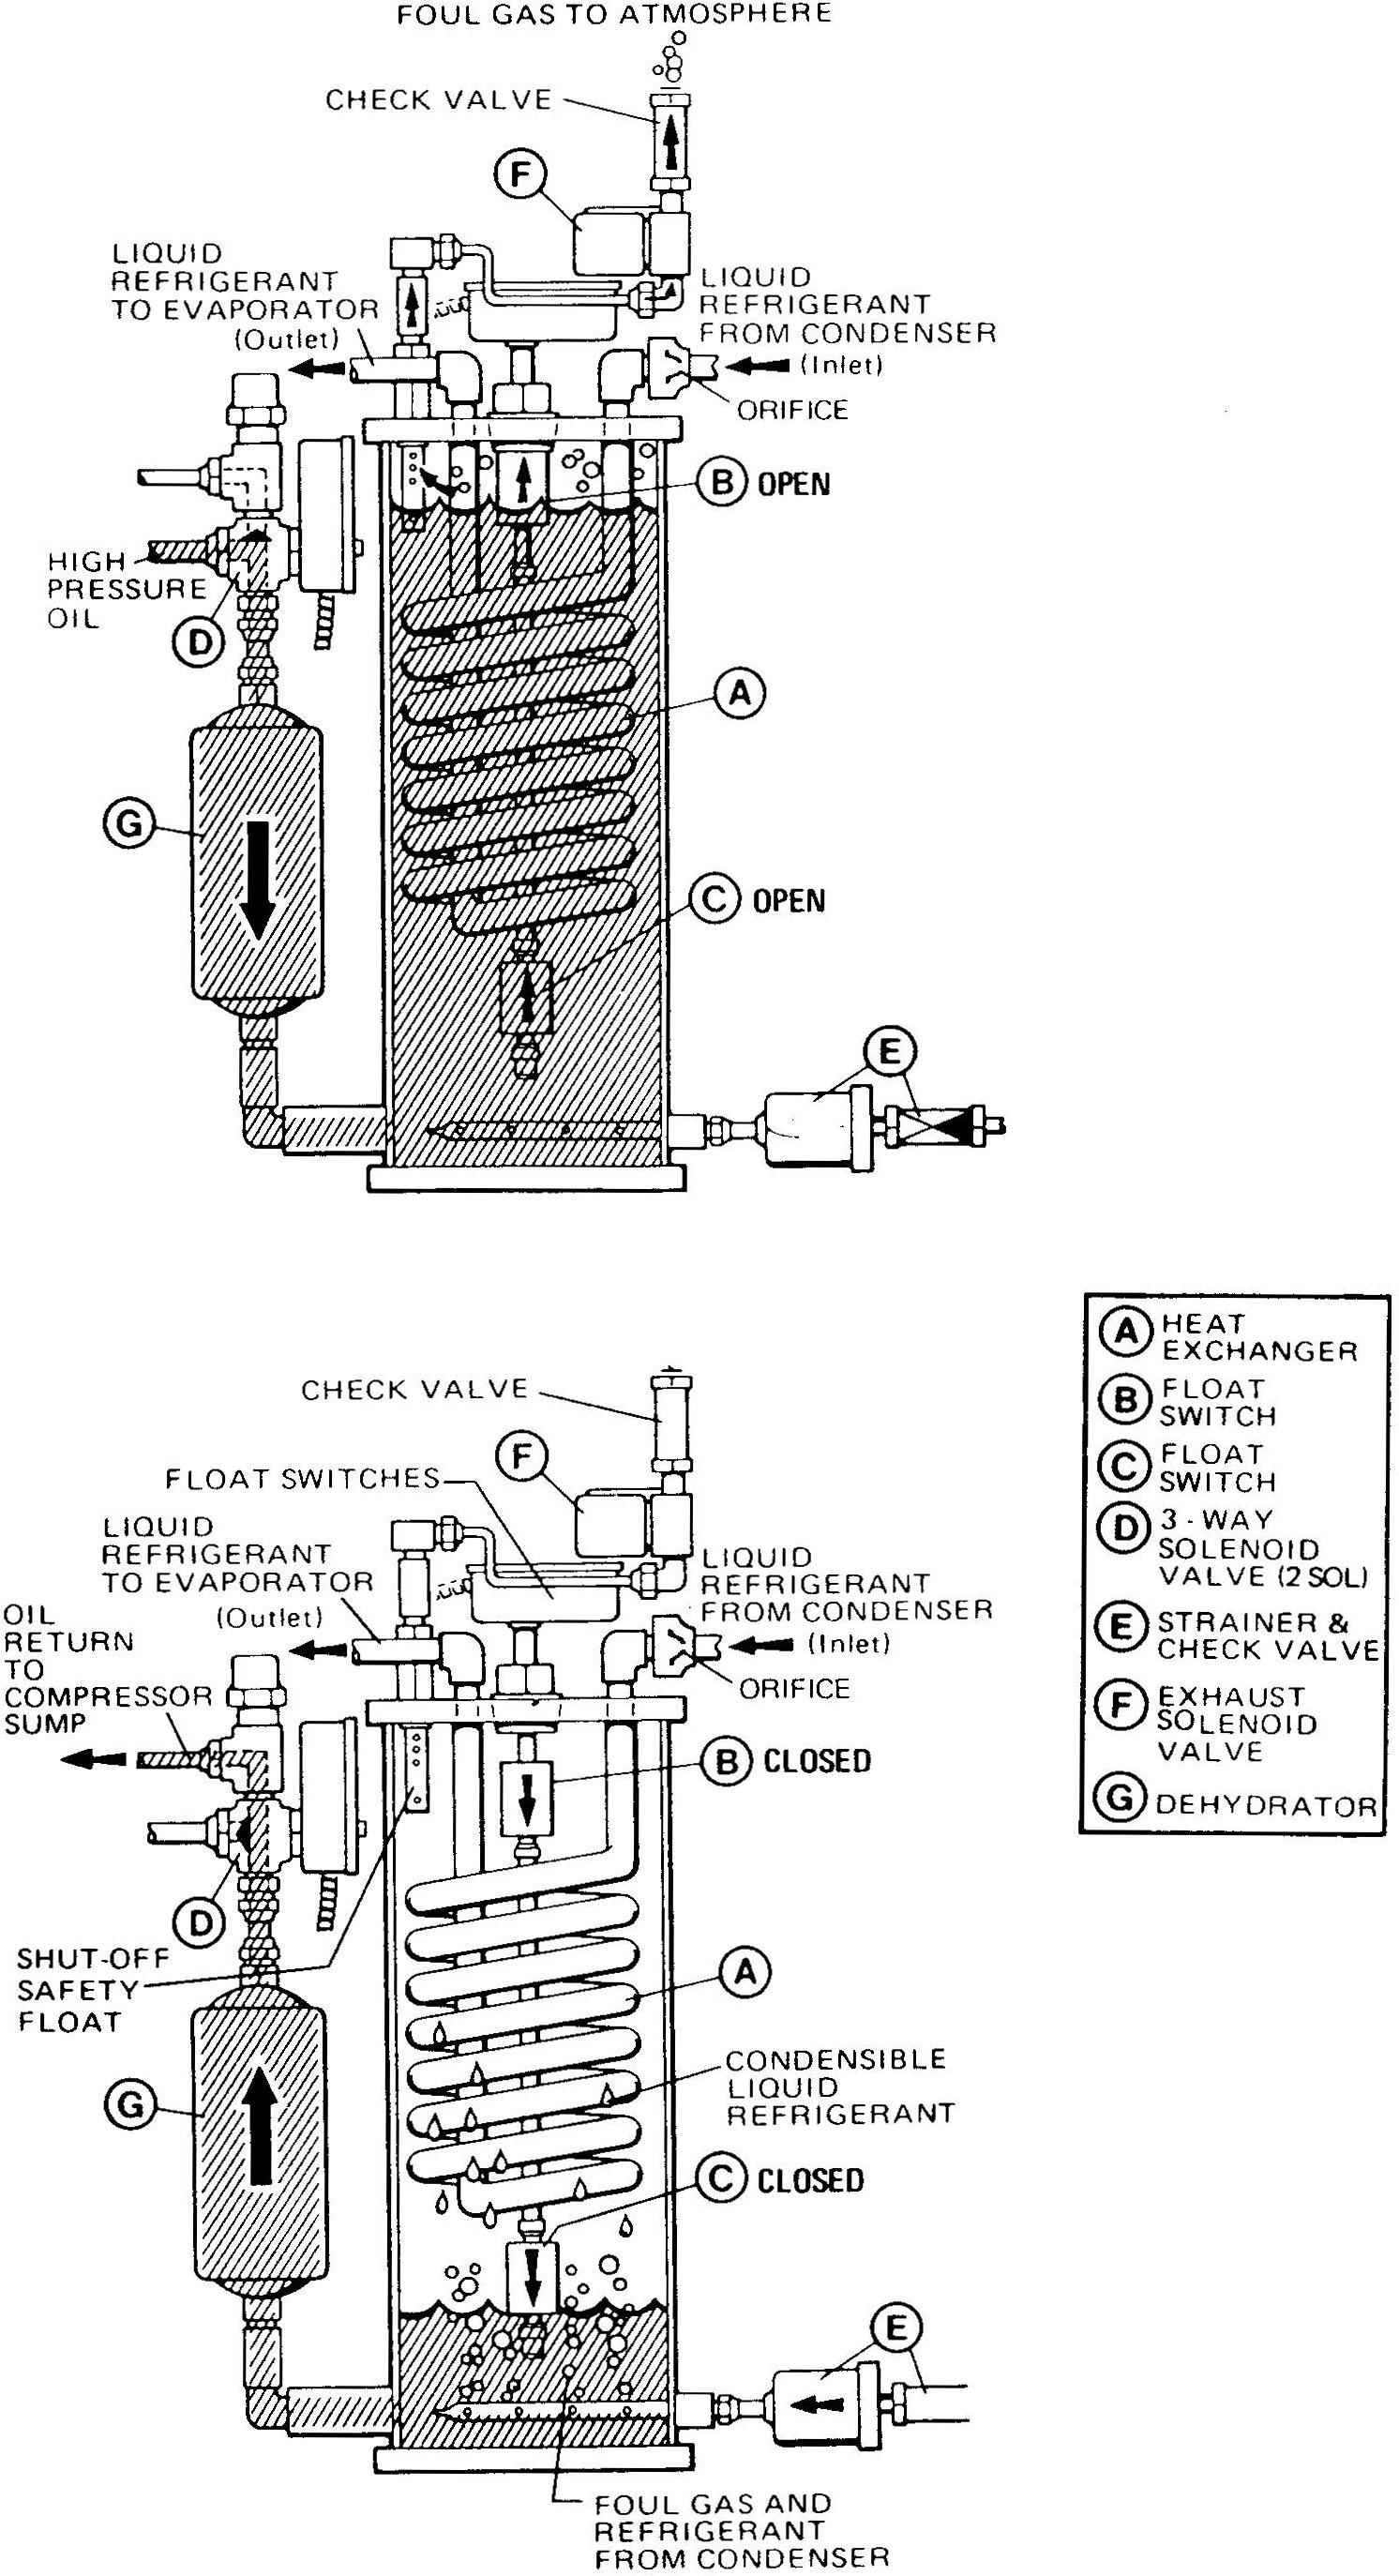 York Chiller Wiring Diagram / Rn 6542 York Chiller Diagram